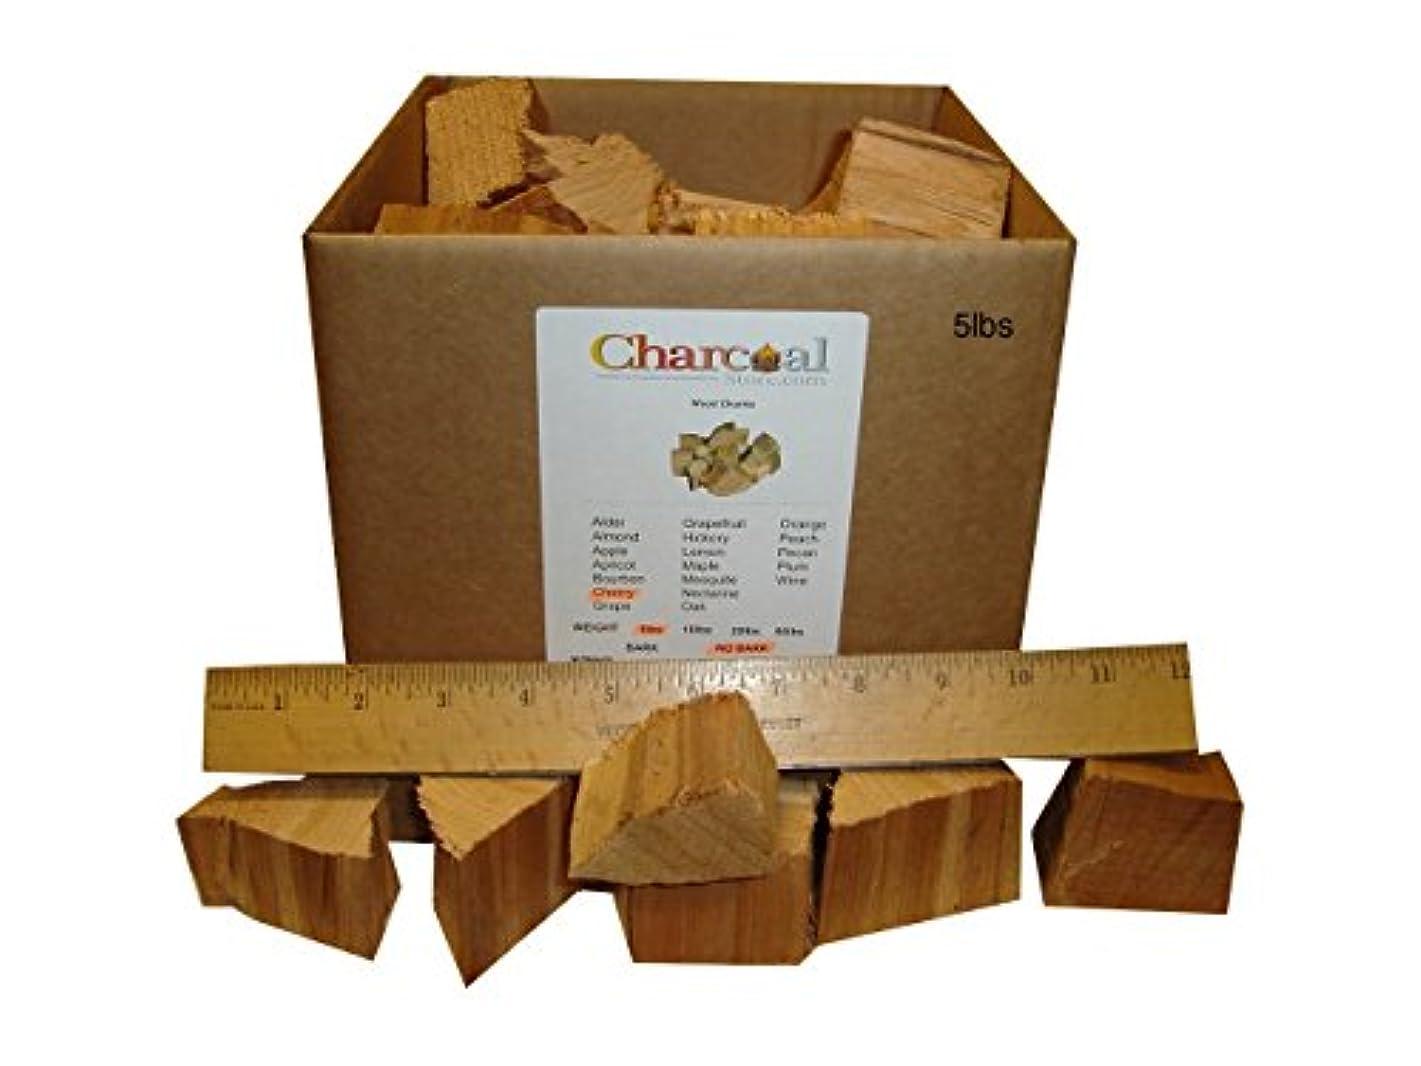 CharcoalStore Cherry Smoking Wood Chunks - No Bark (10 Pounds)